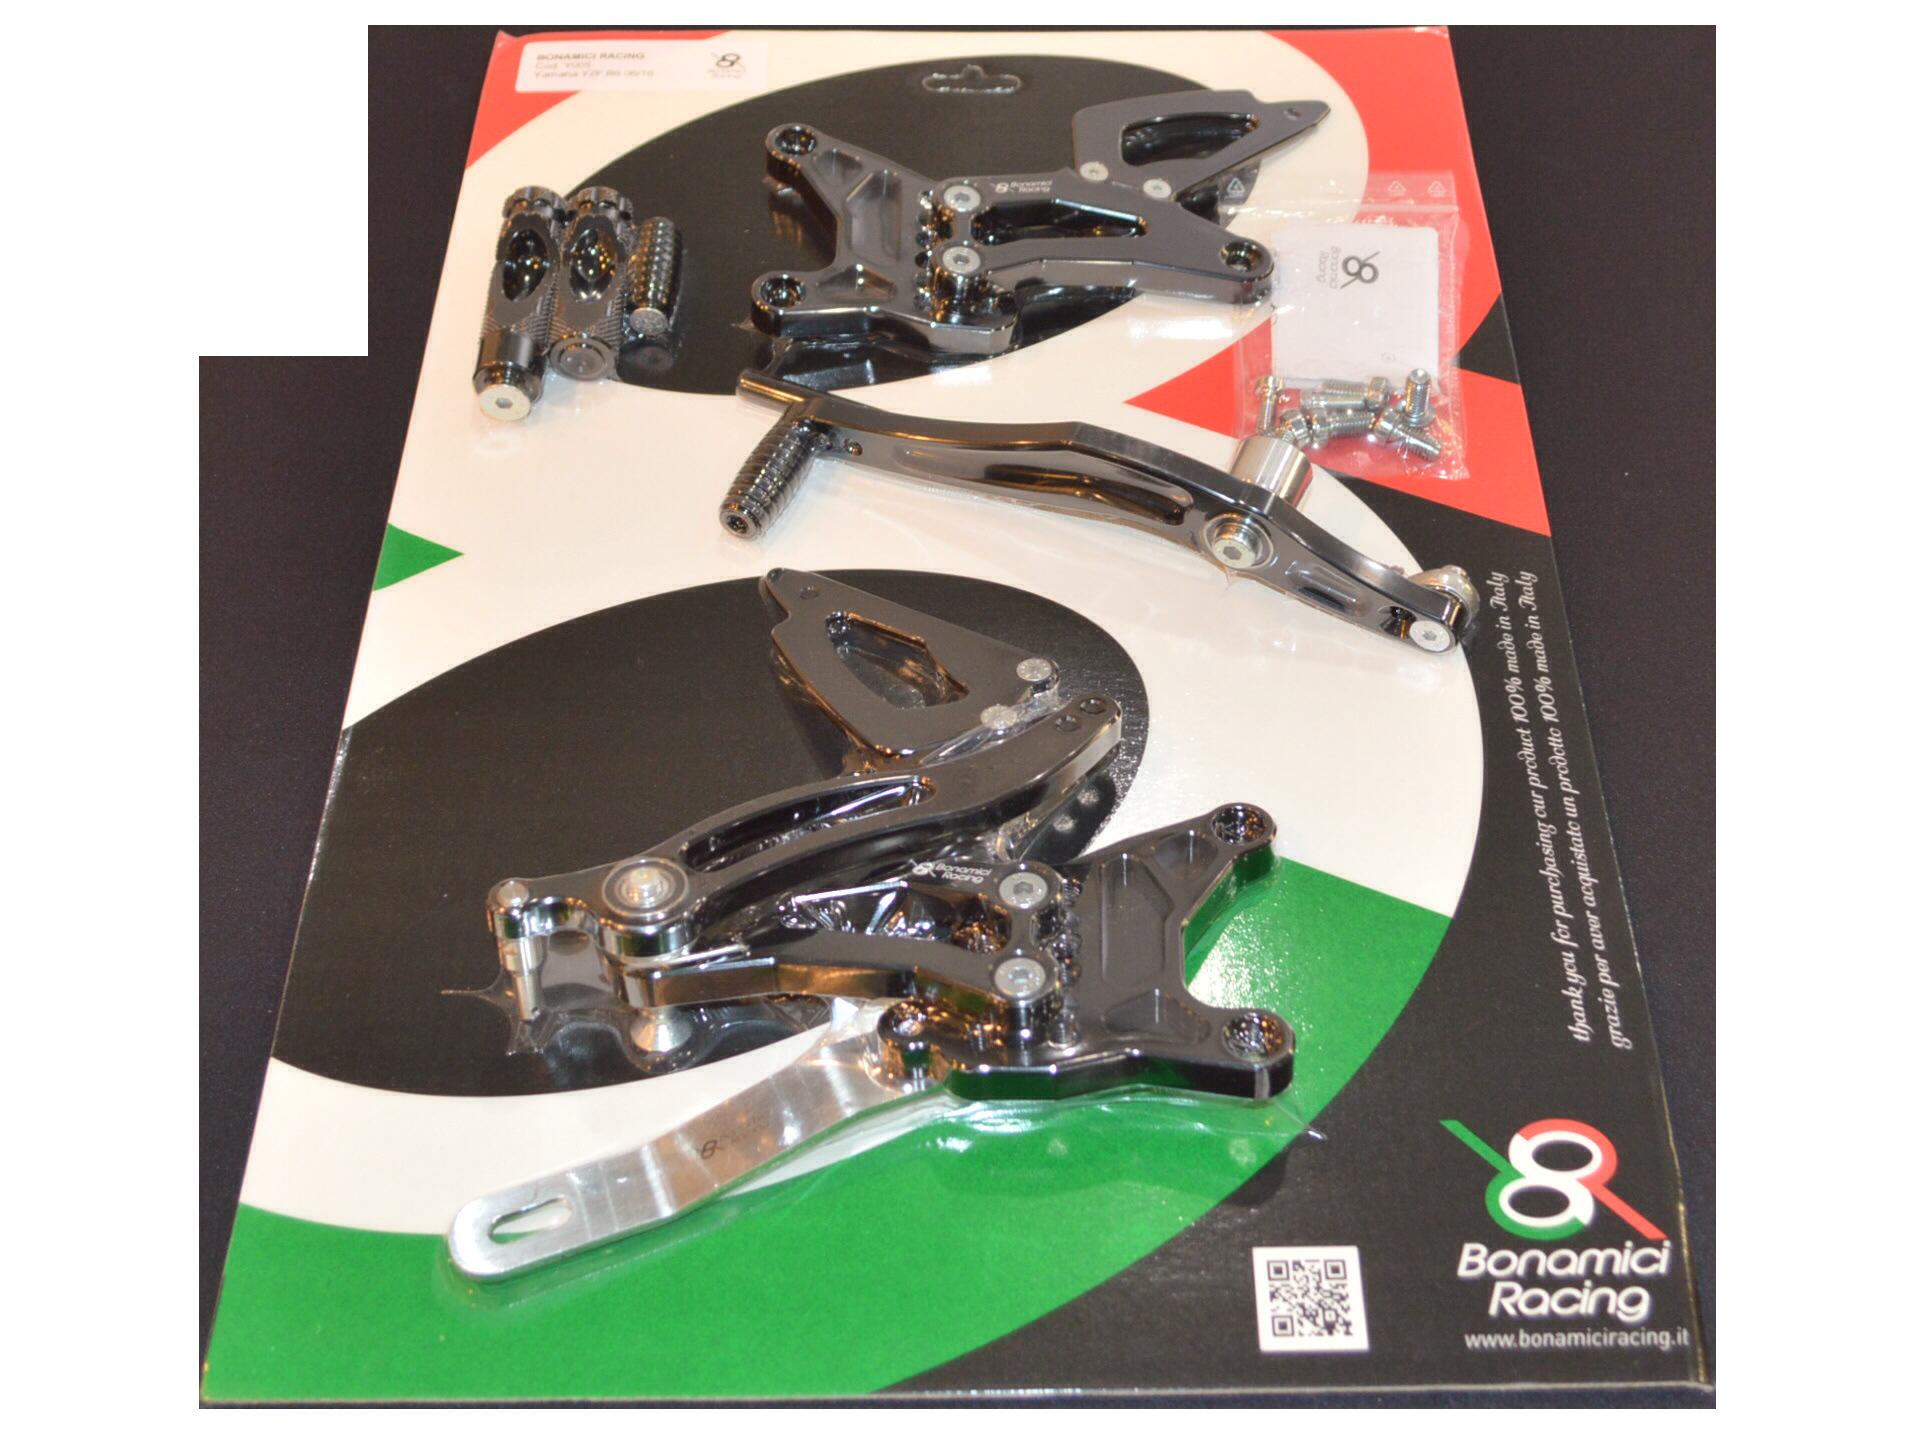 Bonamici Y005 Yamaha R6 Rearsets